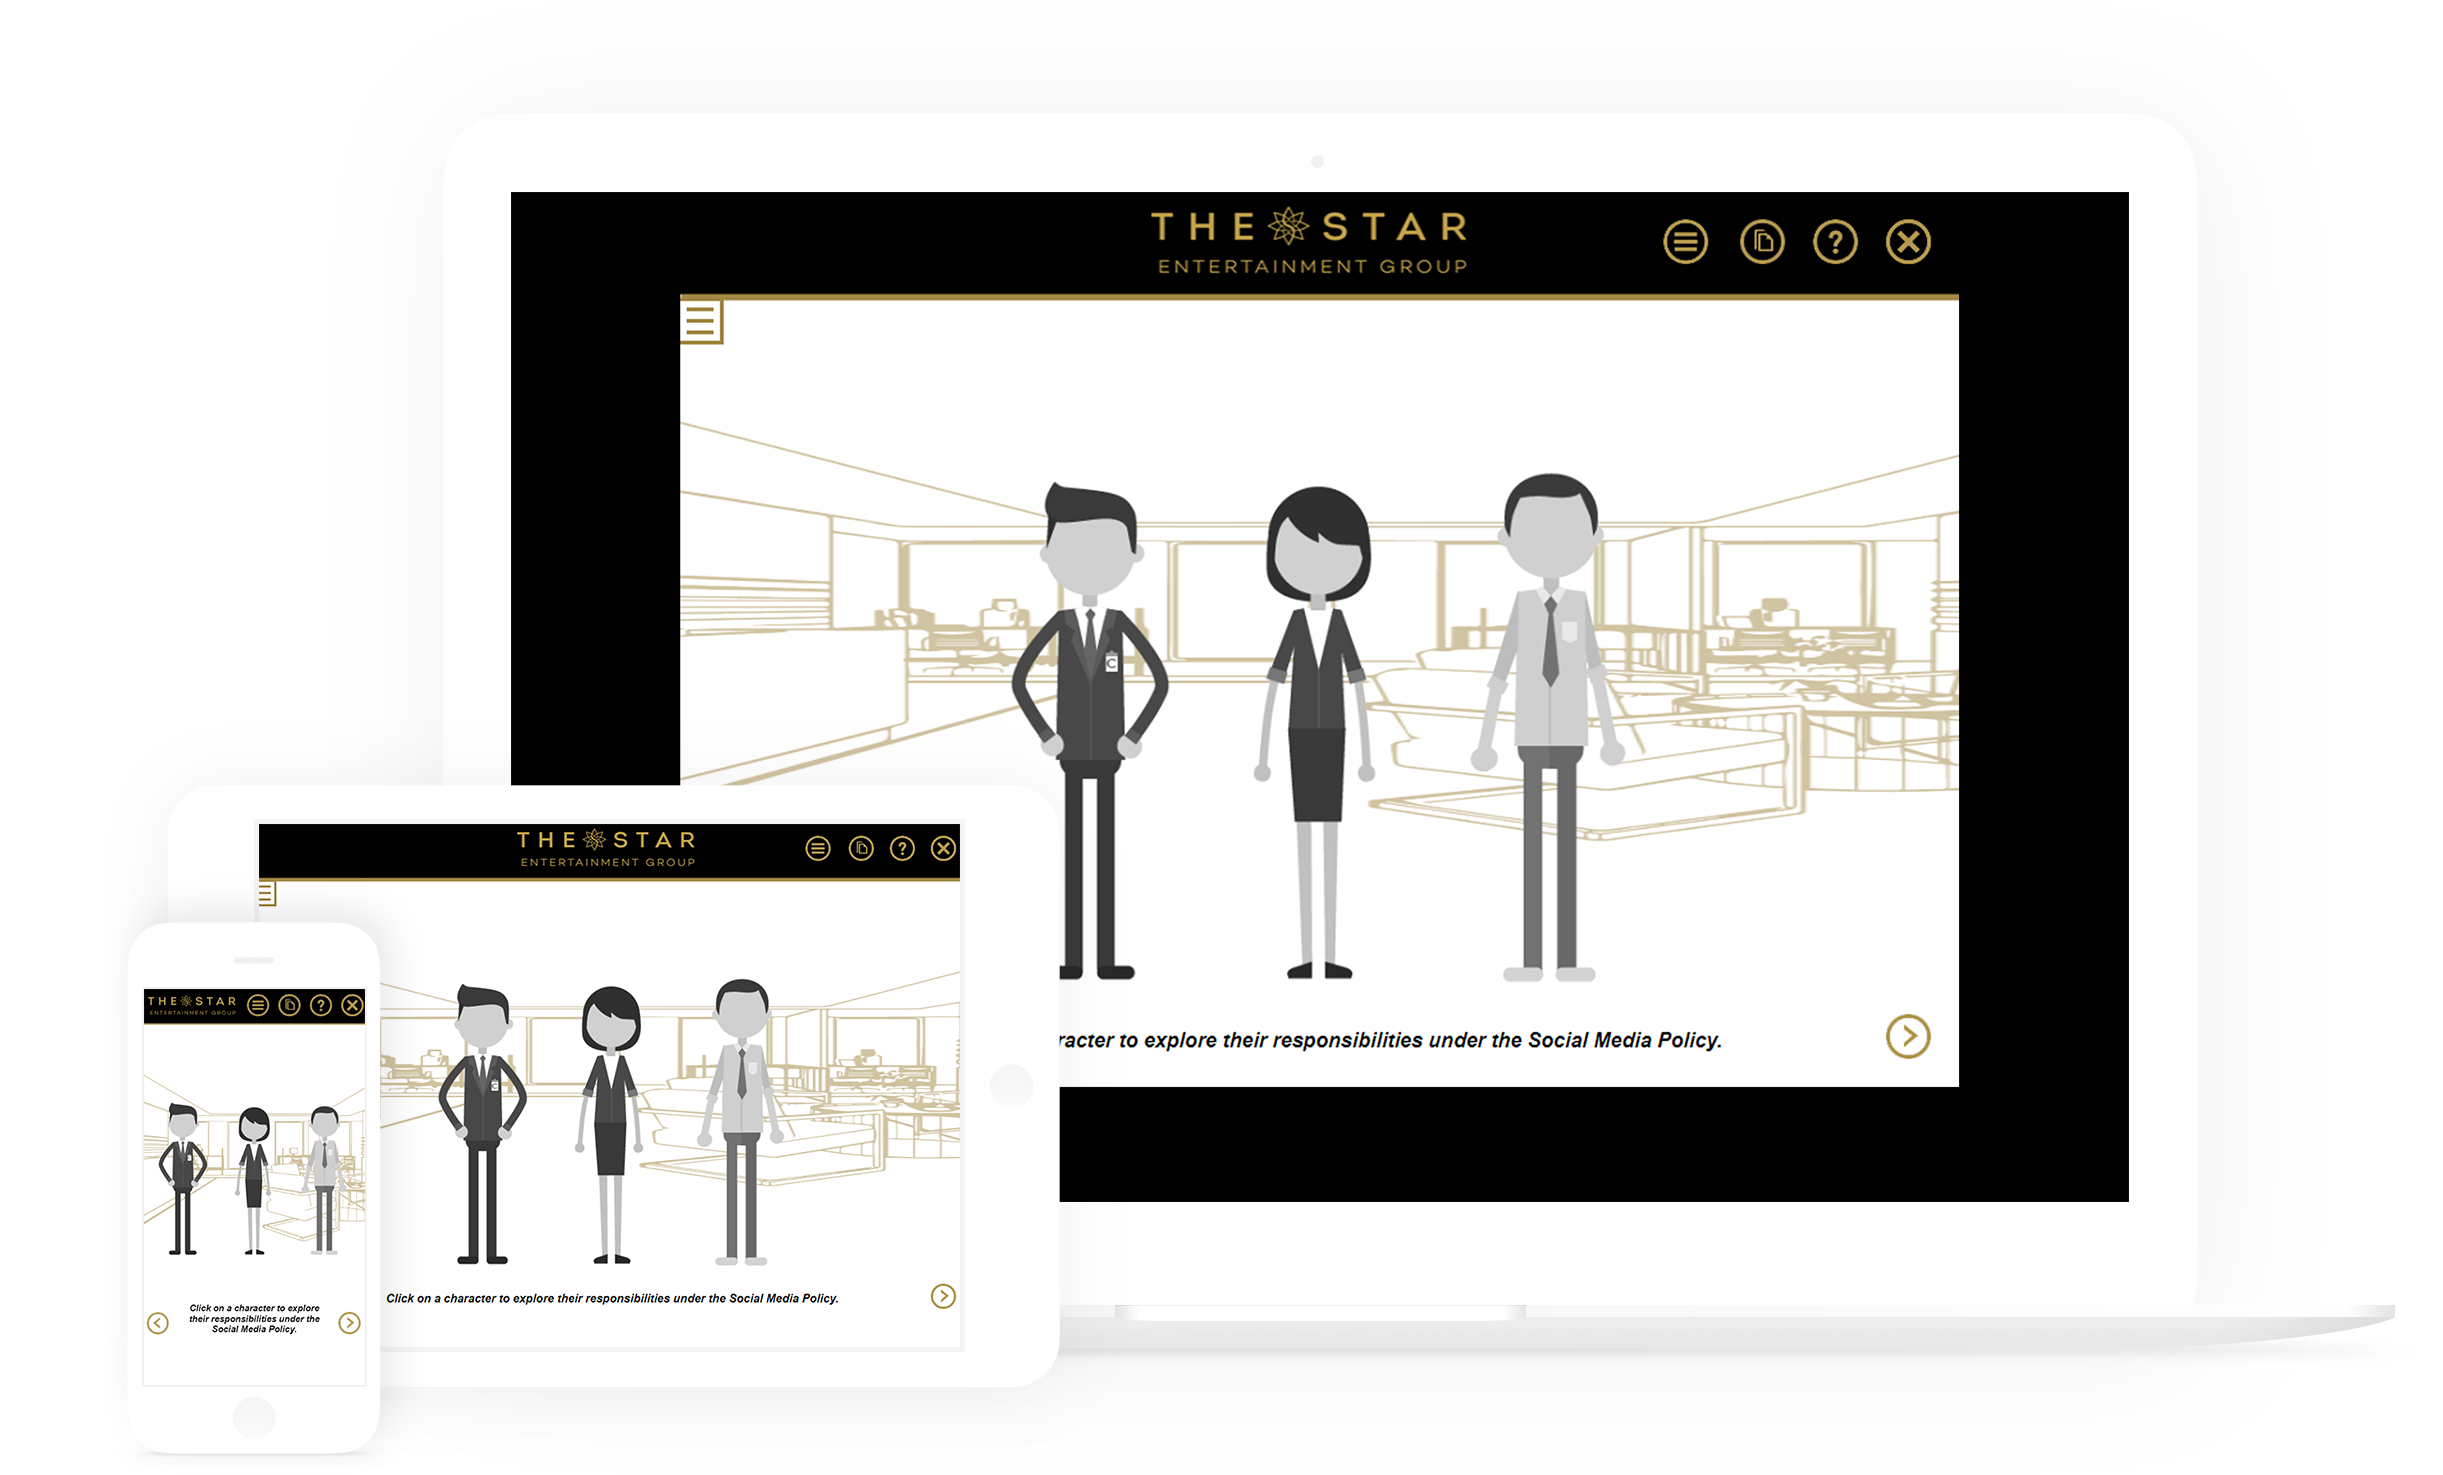 Responsive course design - The Star